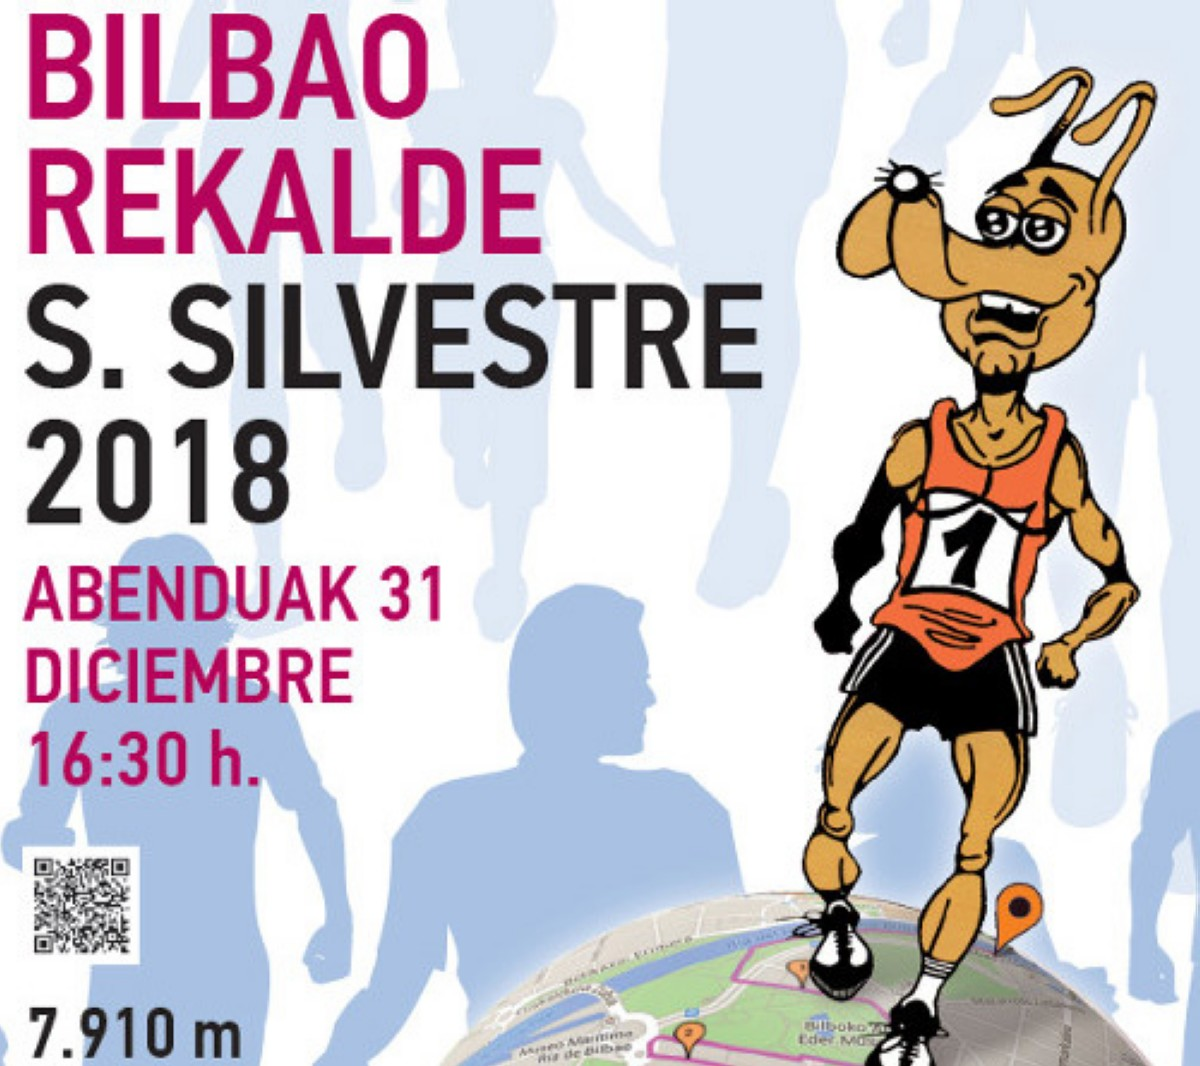 La San Silvestre Bilbao Rekalde 2018